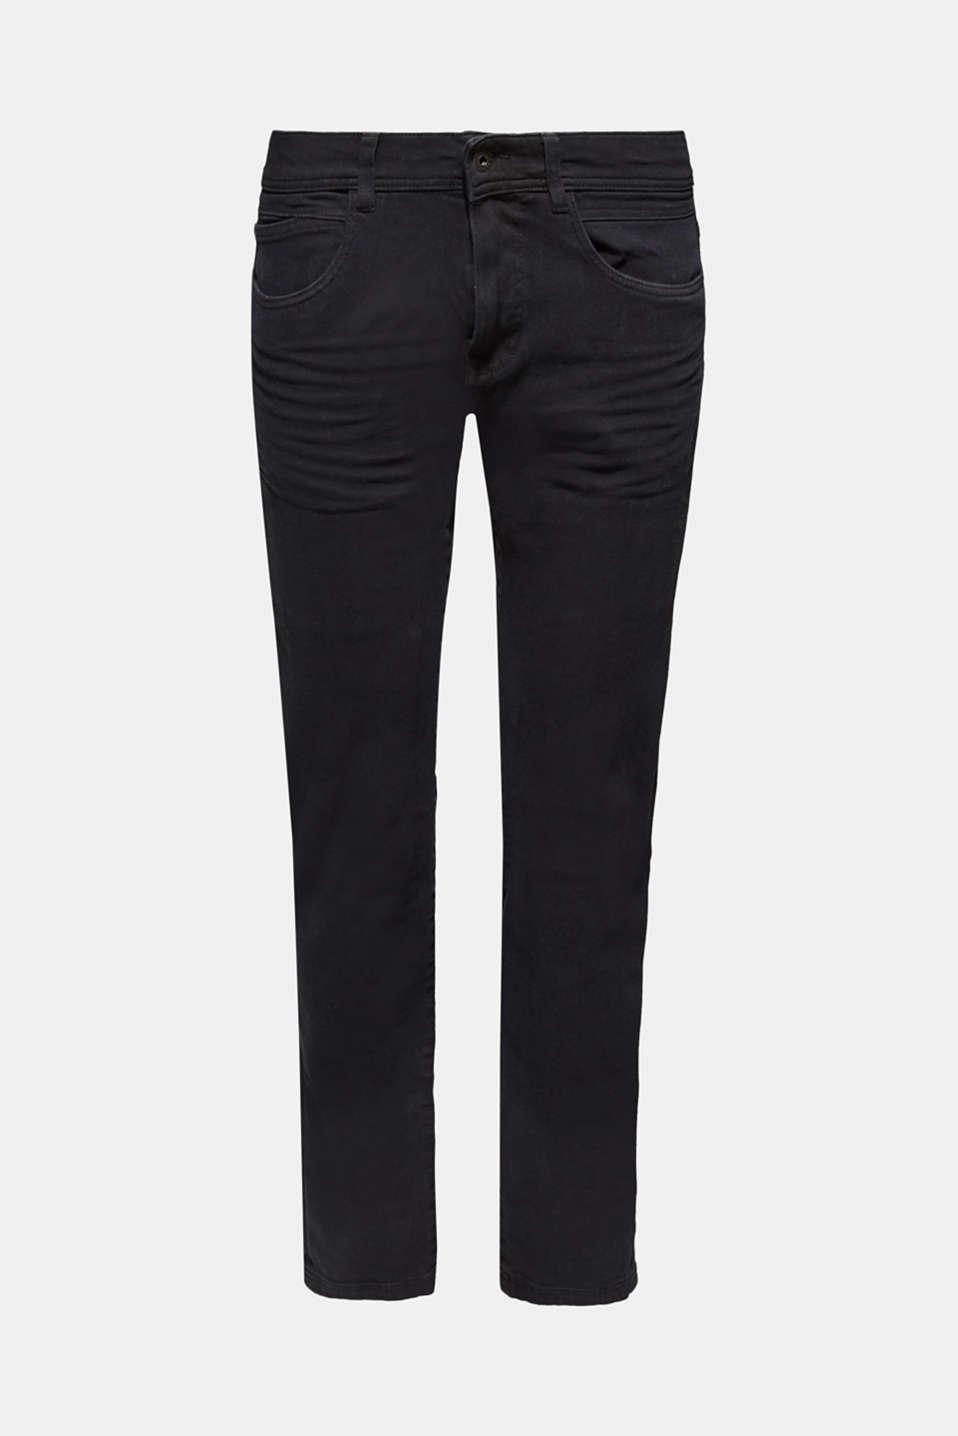 Pants woven Slim fit, BLACK, detail image number 5